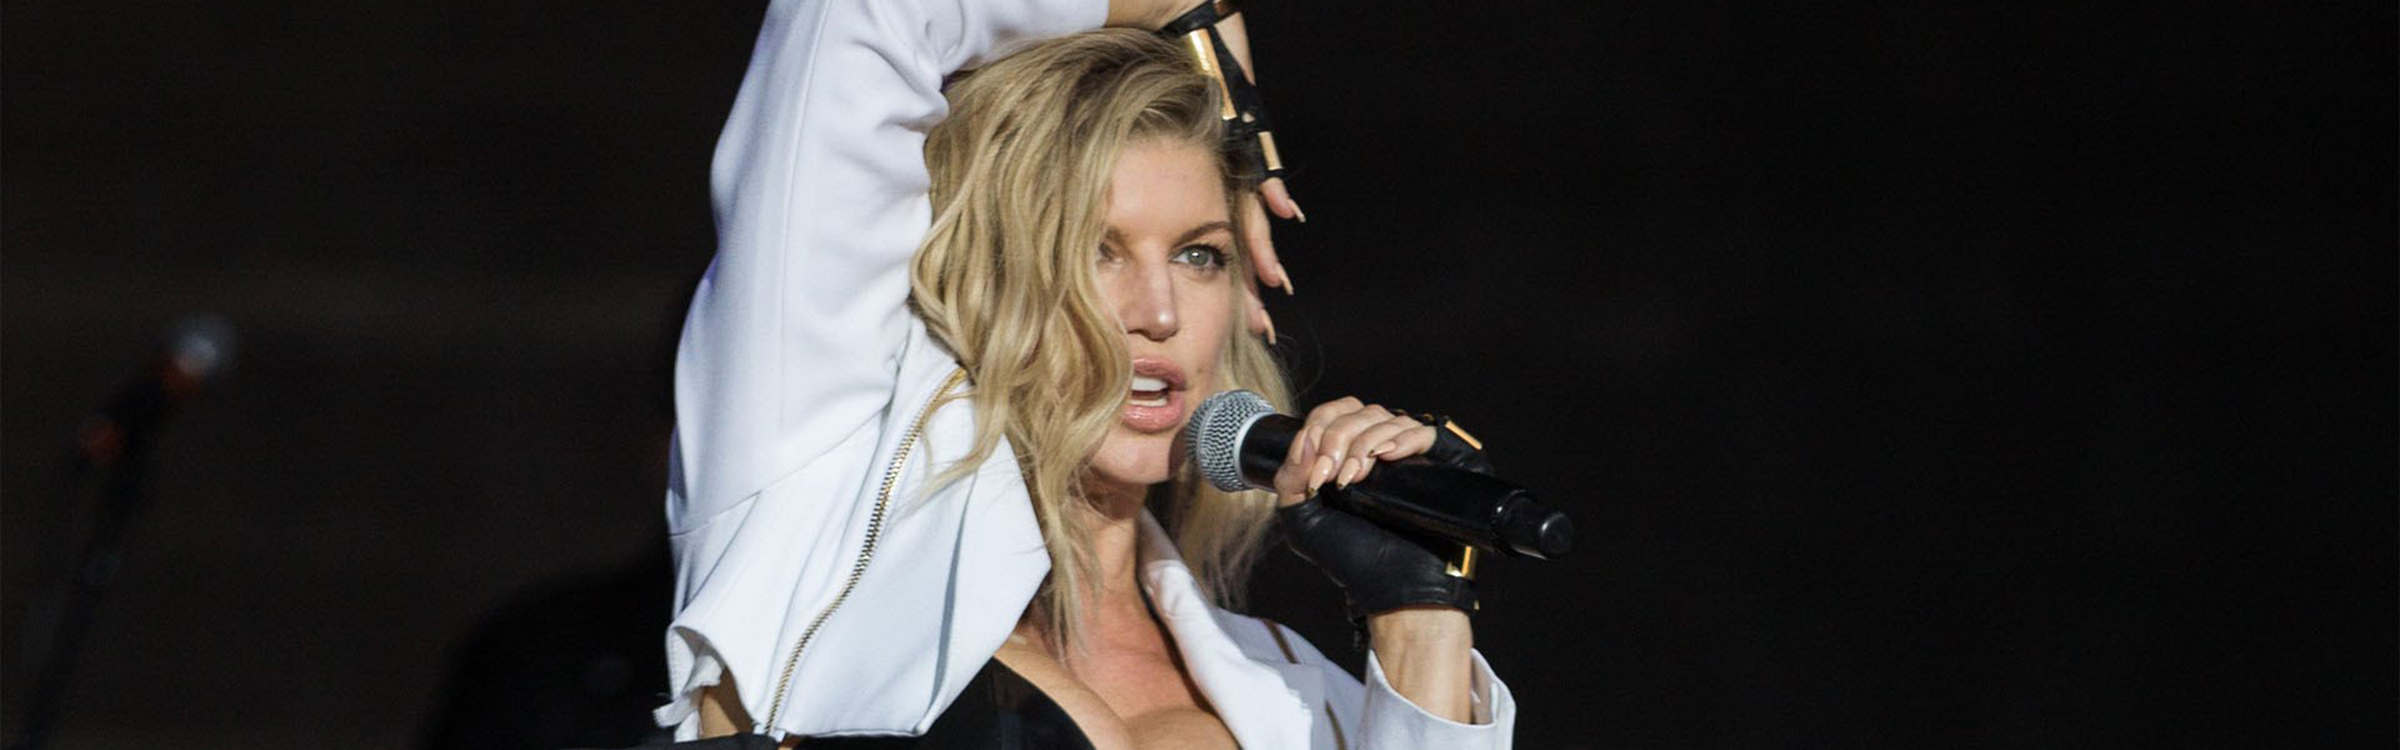 Fergie ferg new music